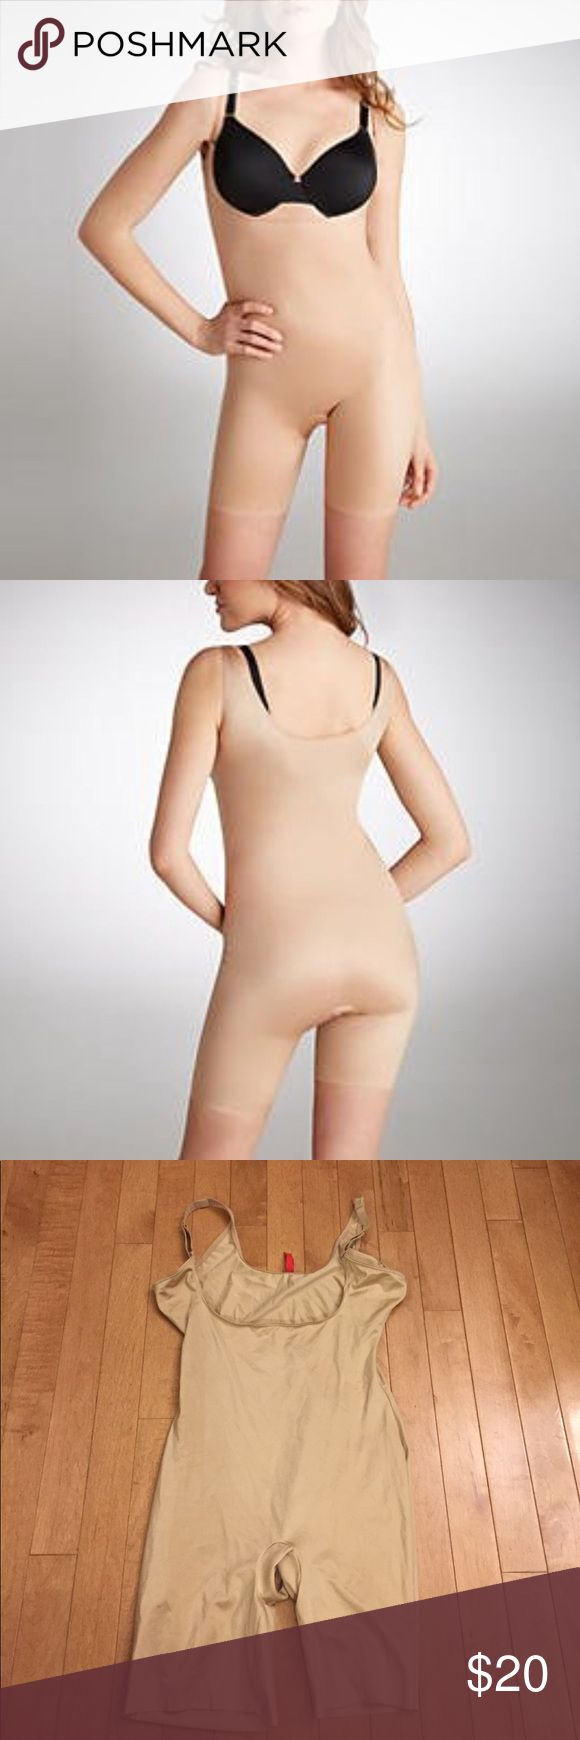 Spanx Size Large Simplicity Under Bust Shaper Excellent Condition! Size Large Spanx Shaper SPANX Intimates & Sleepwear Shapewear